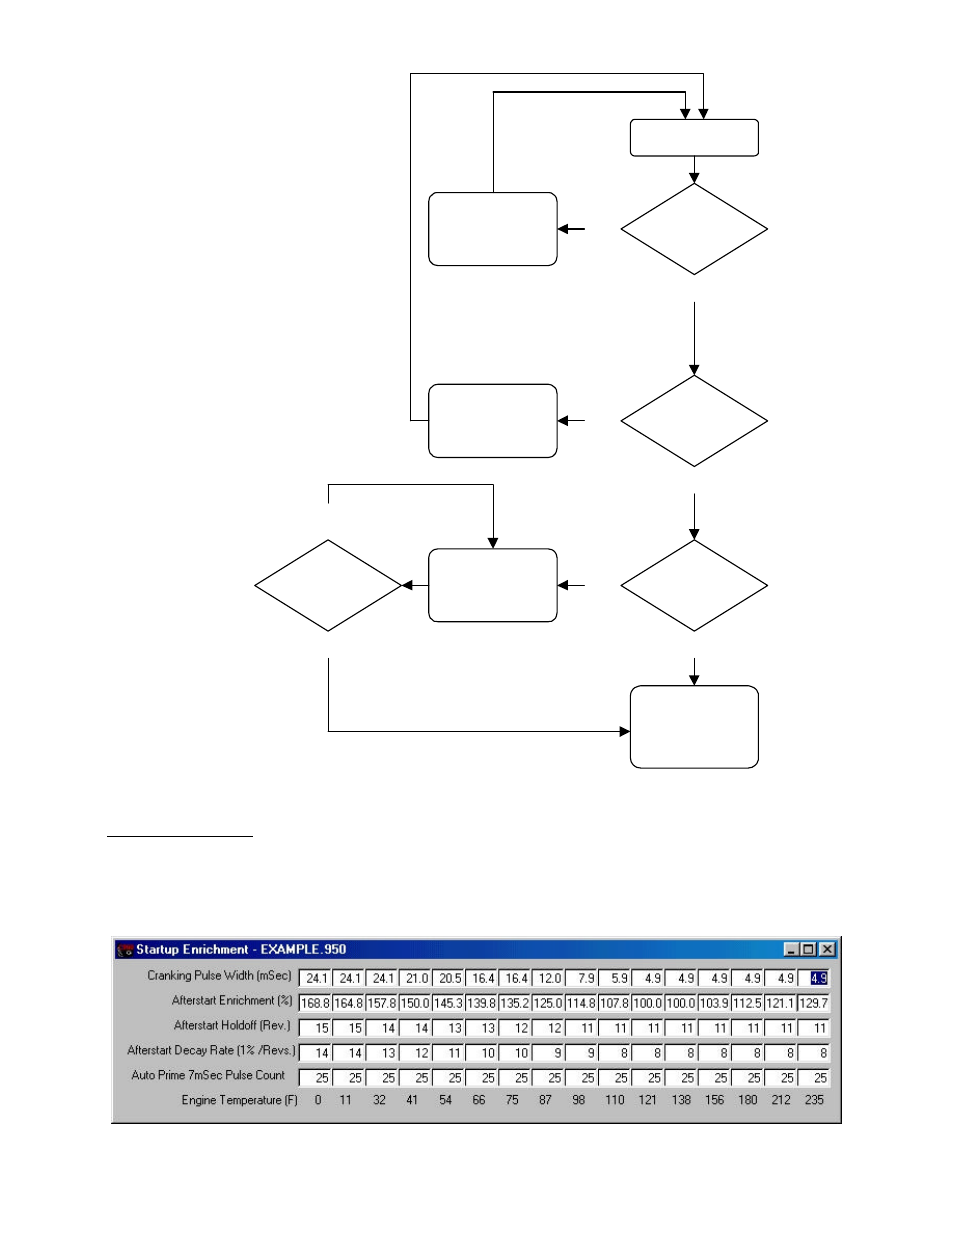 holley commander 950 user manual page 49 98 original mode rh manualsdir com Manuals in PDF holley digital dash user manual